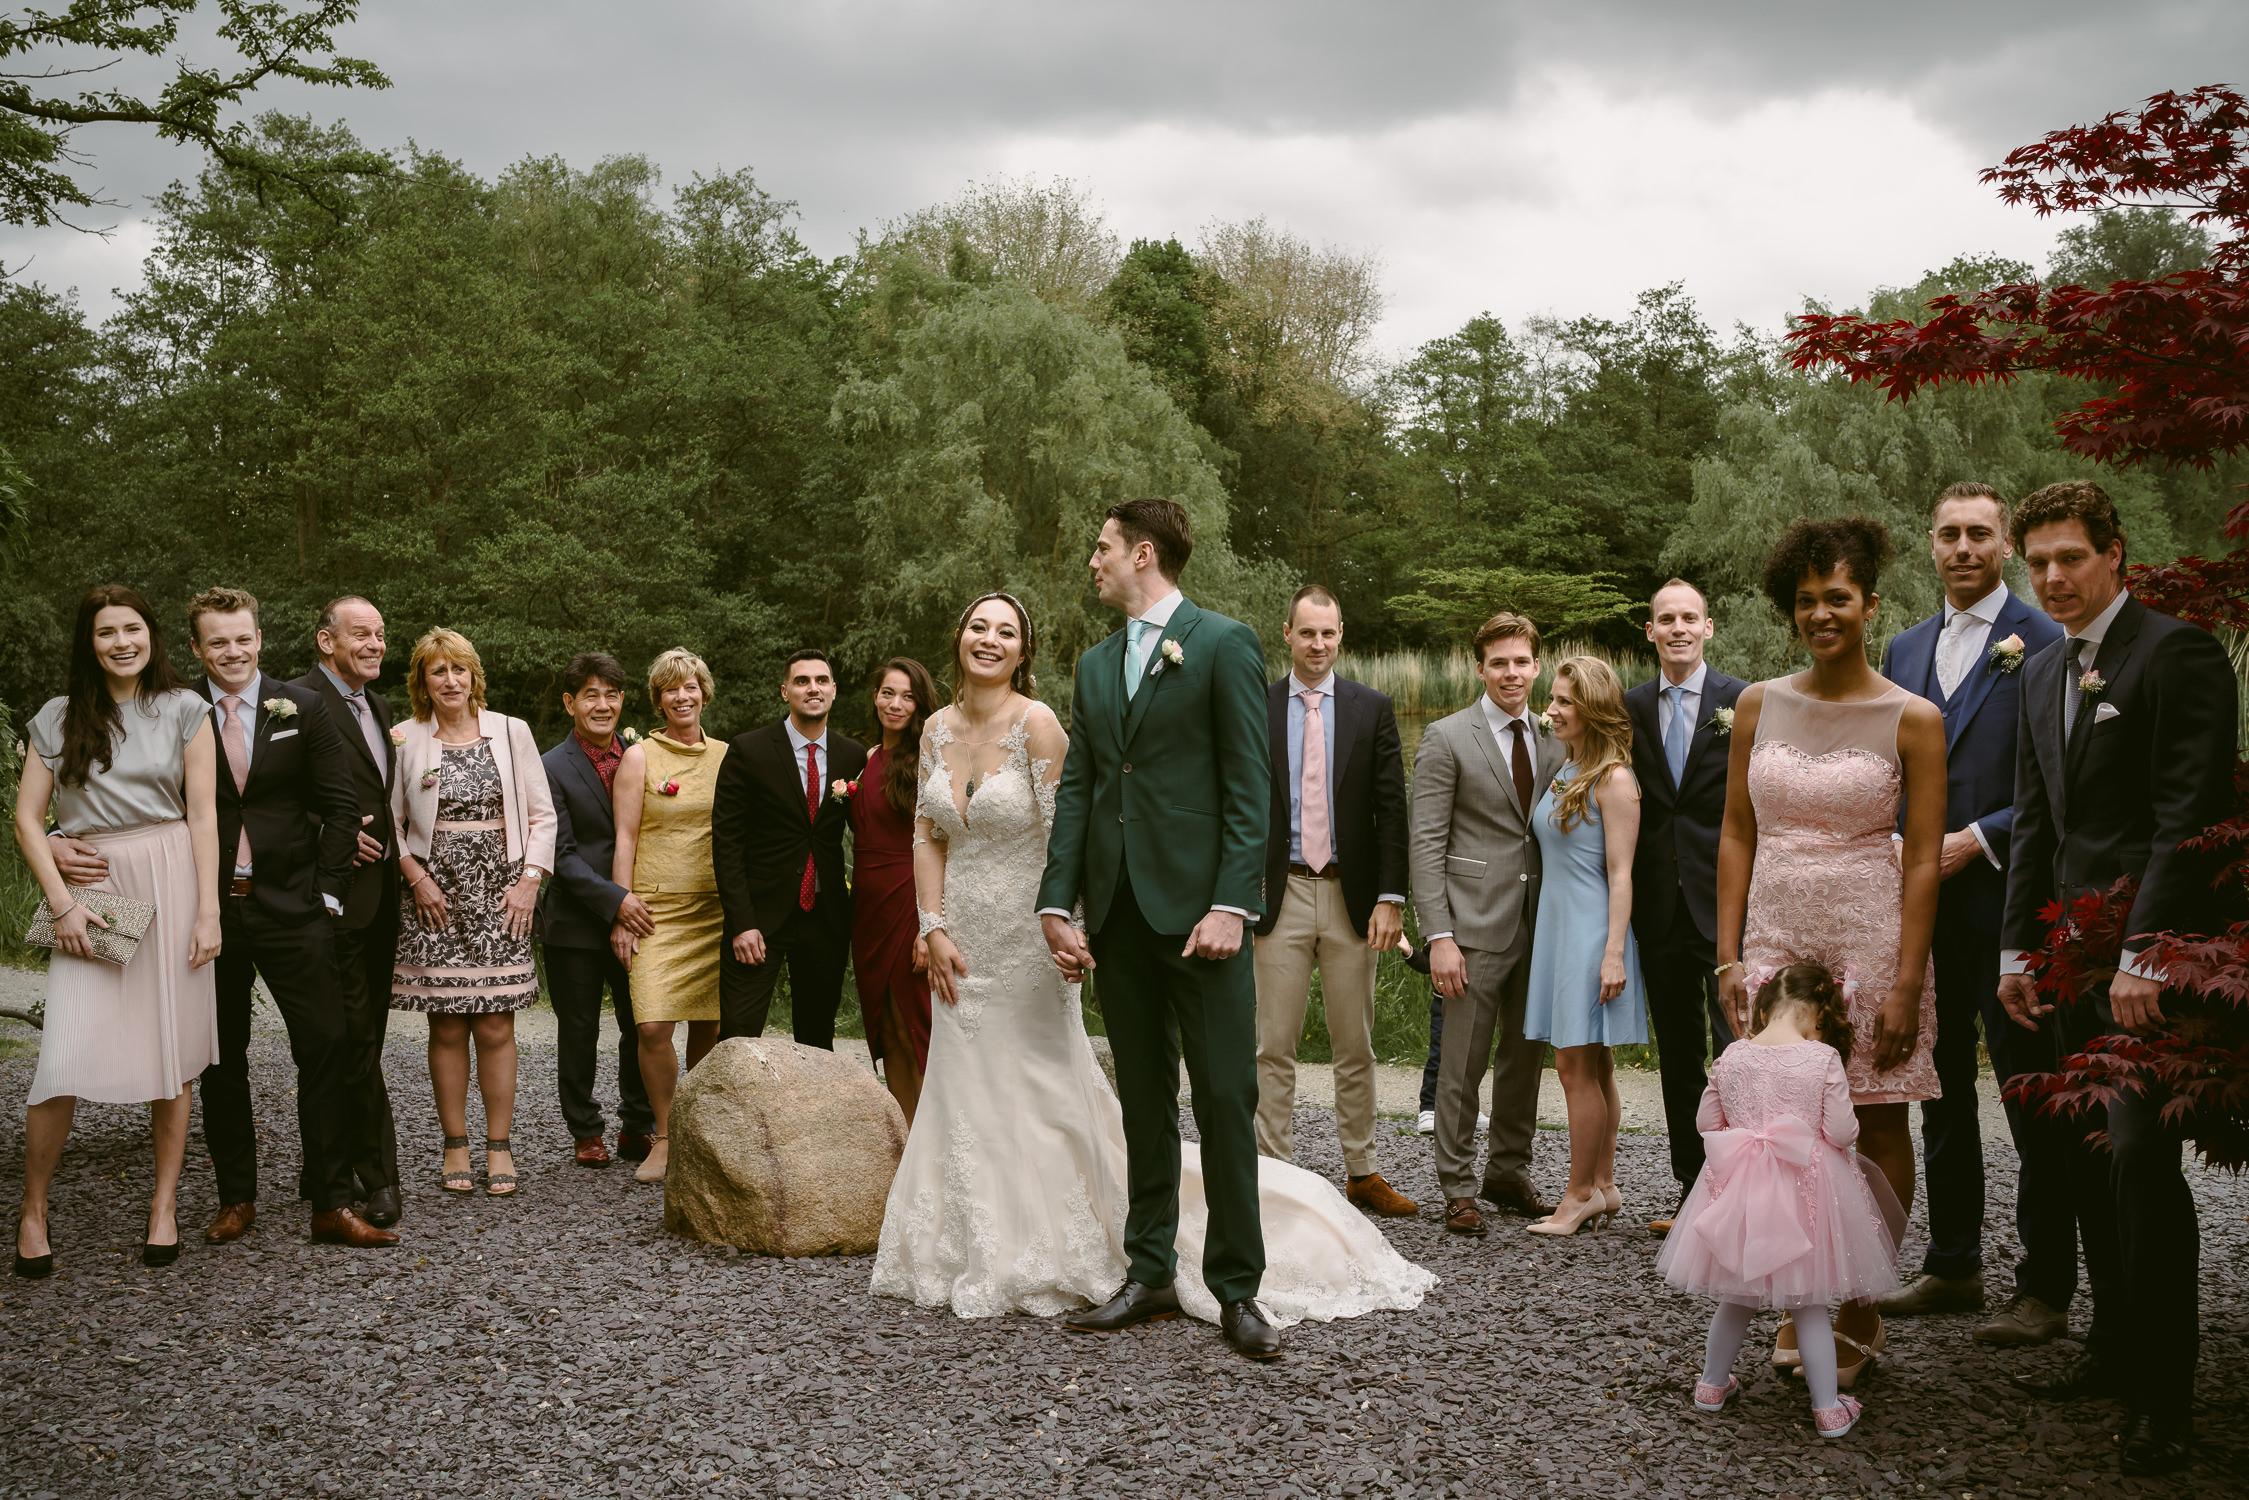 bruidsfotografie-amsterdam-utrecht-trouwfotograaf-mark-hadden-wedding-photography-Robin & Guus-132.jpg